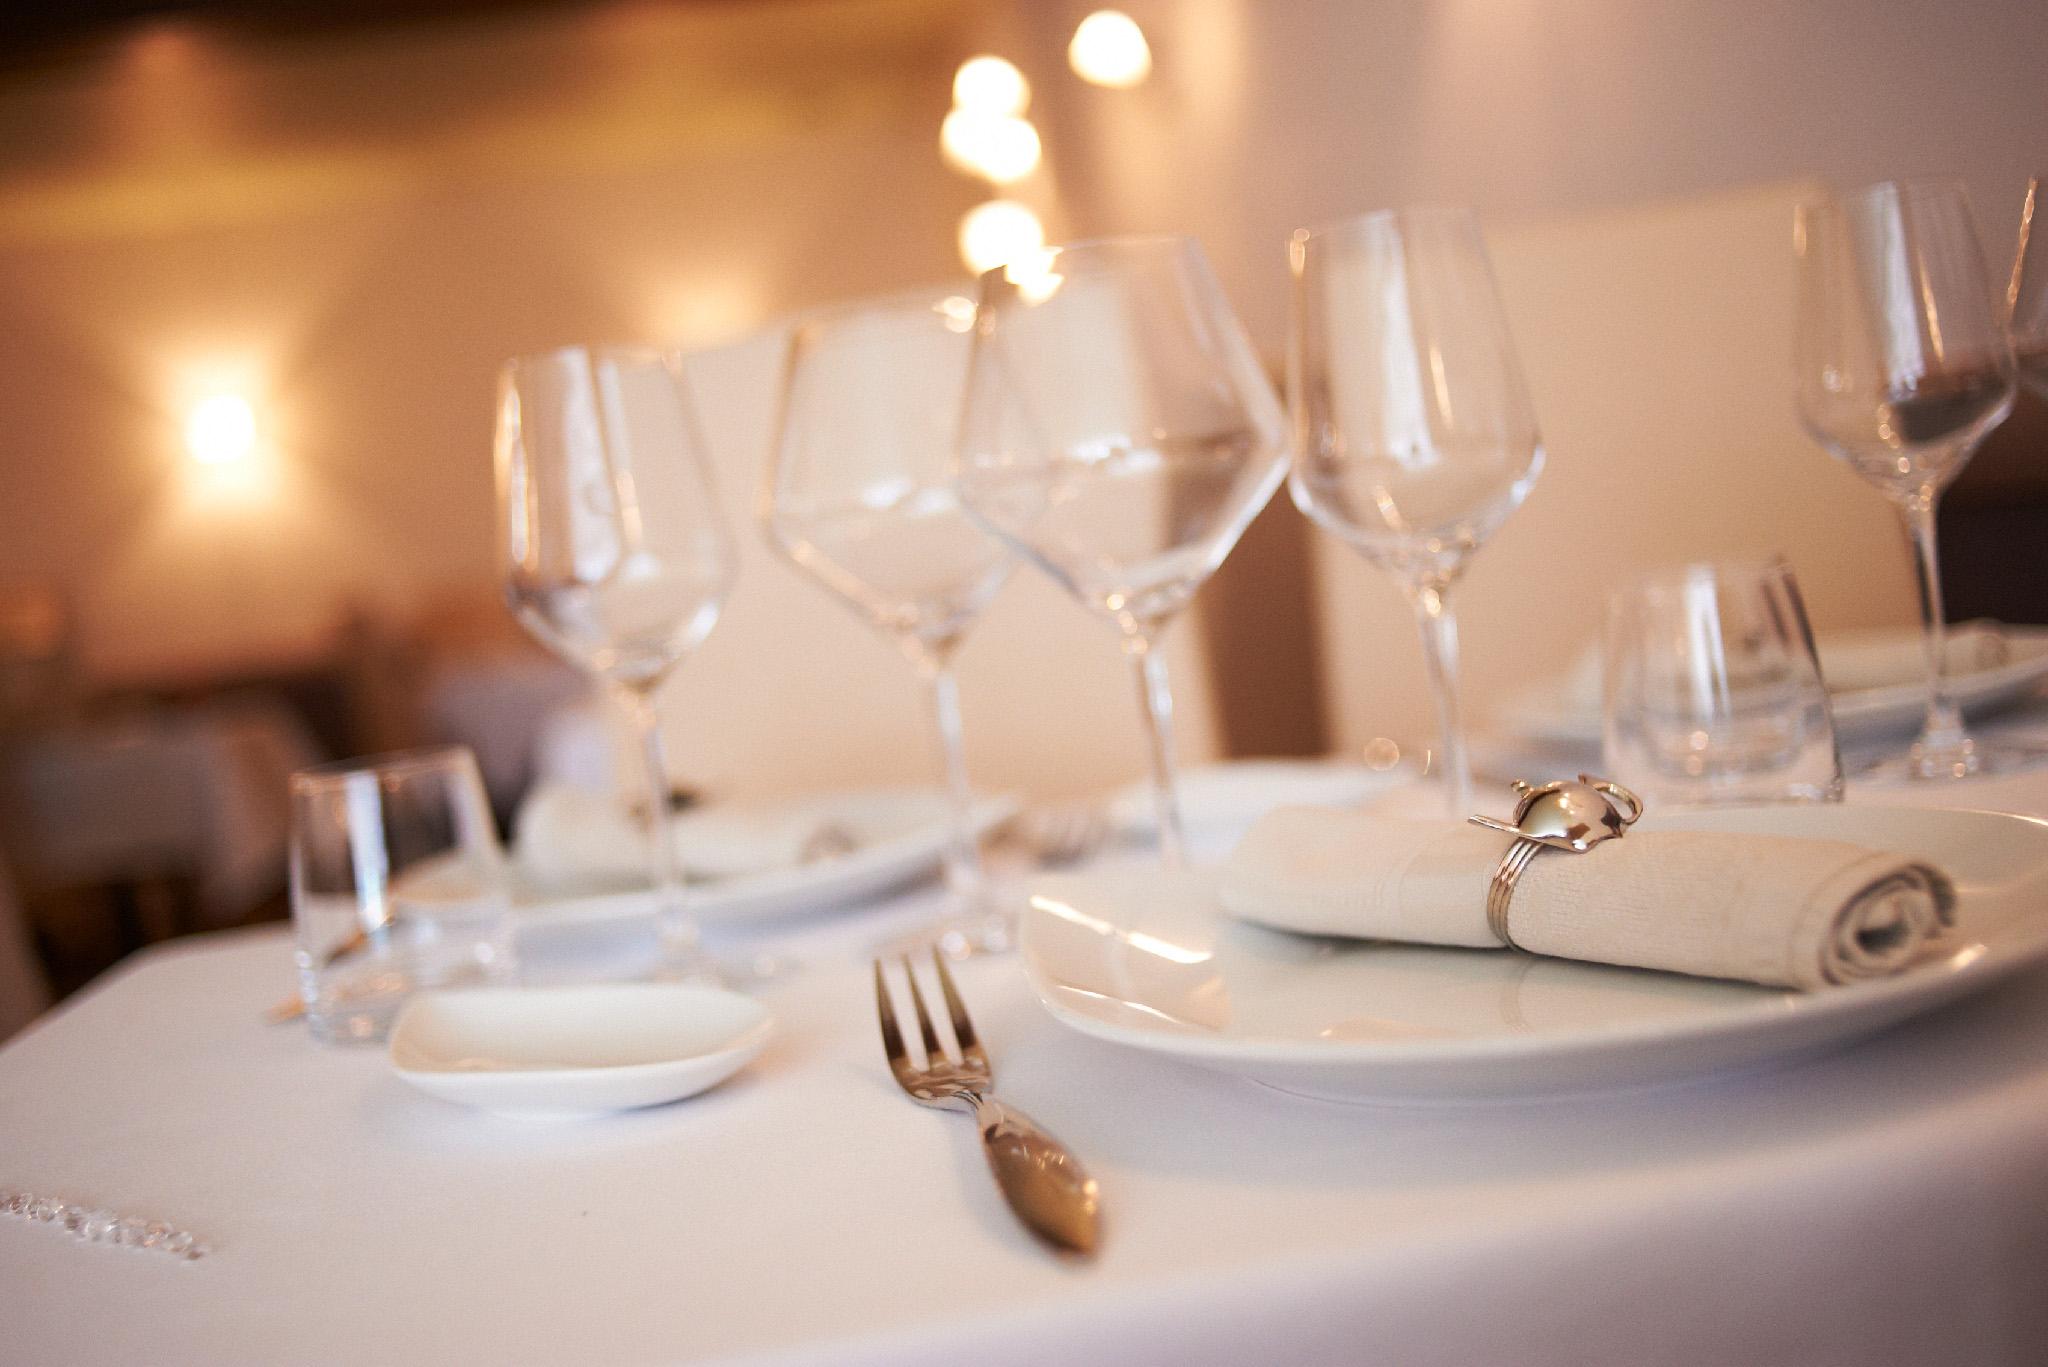 107_photographie_hotel_restaurant_nantes